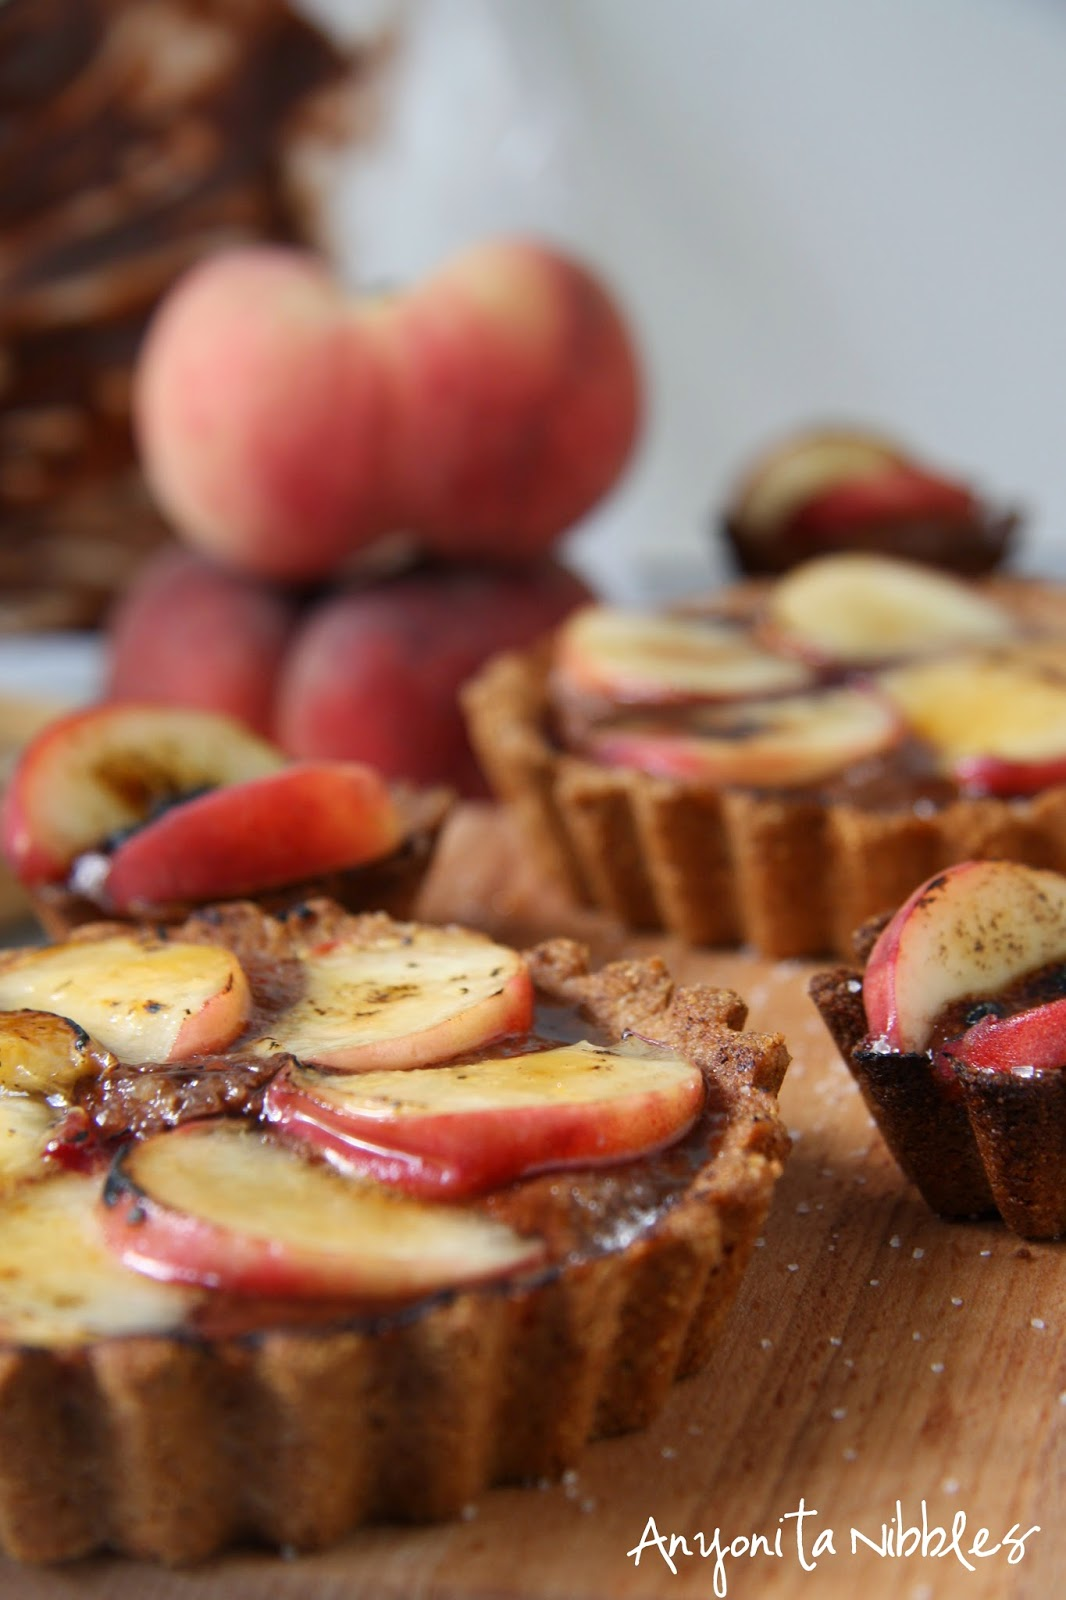 Sumptuous and decadent peach tarts by Anyonita Nibbles